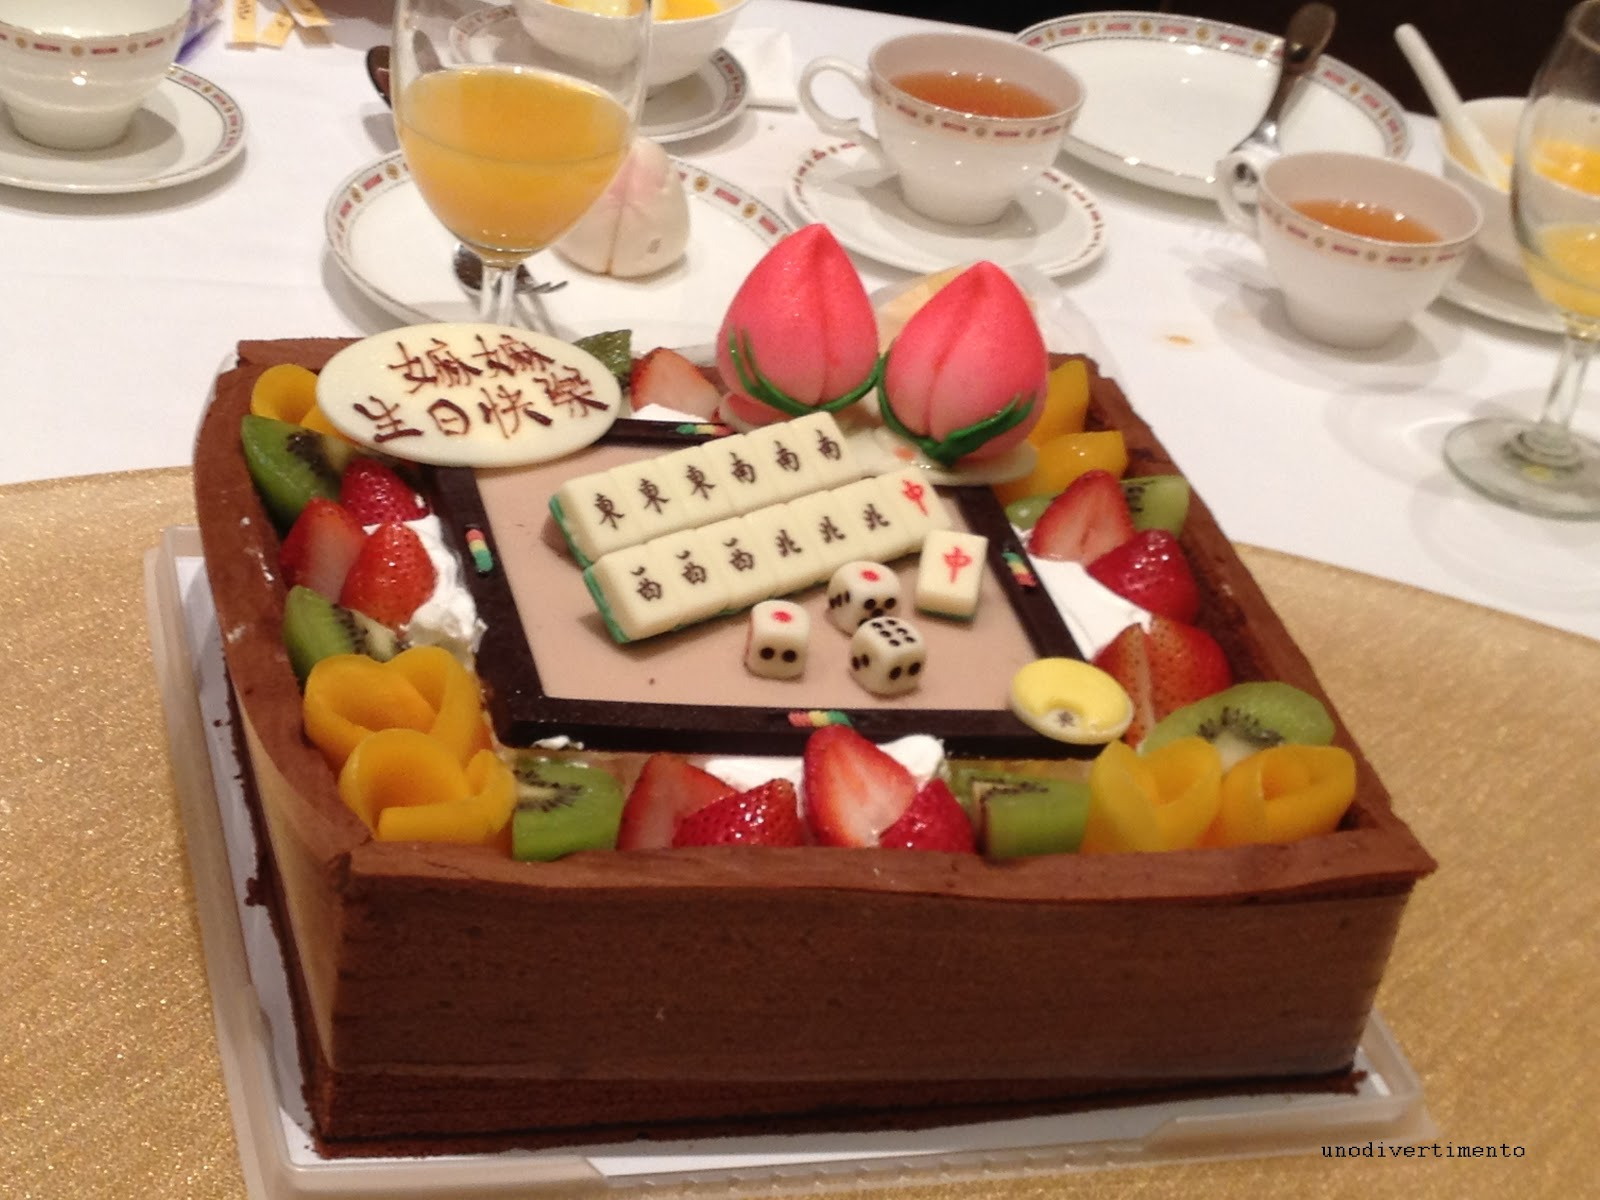 Divertimento Mahjong Cake